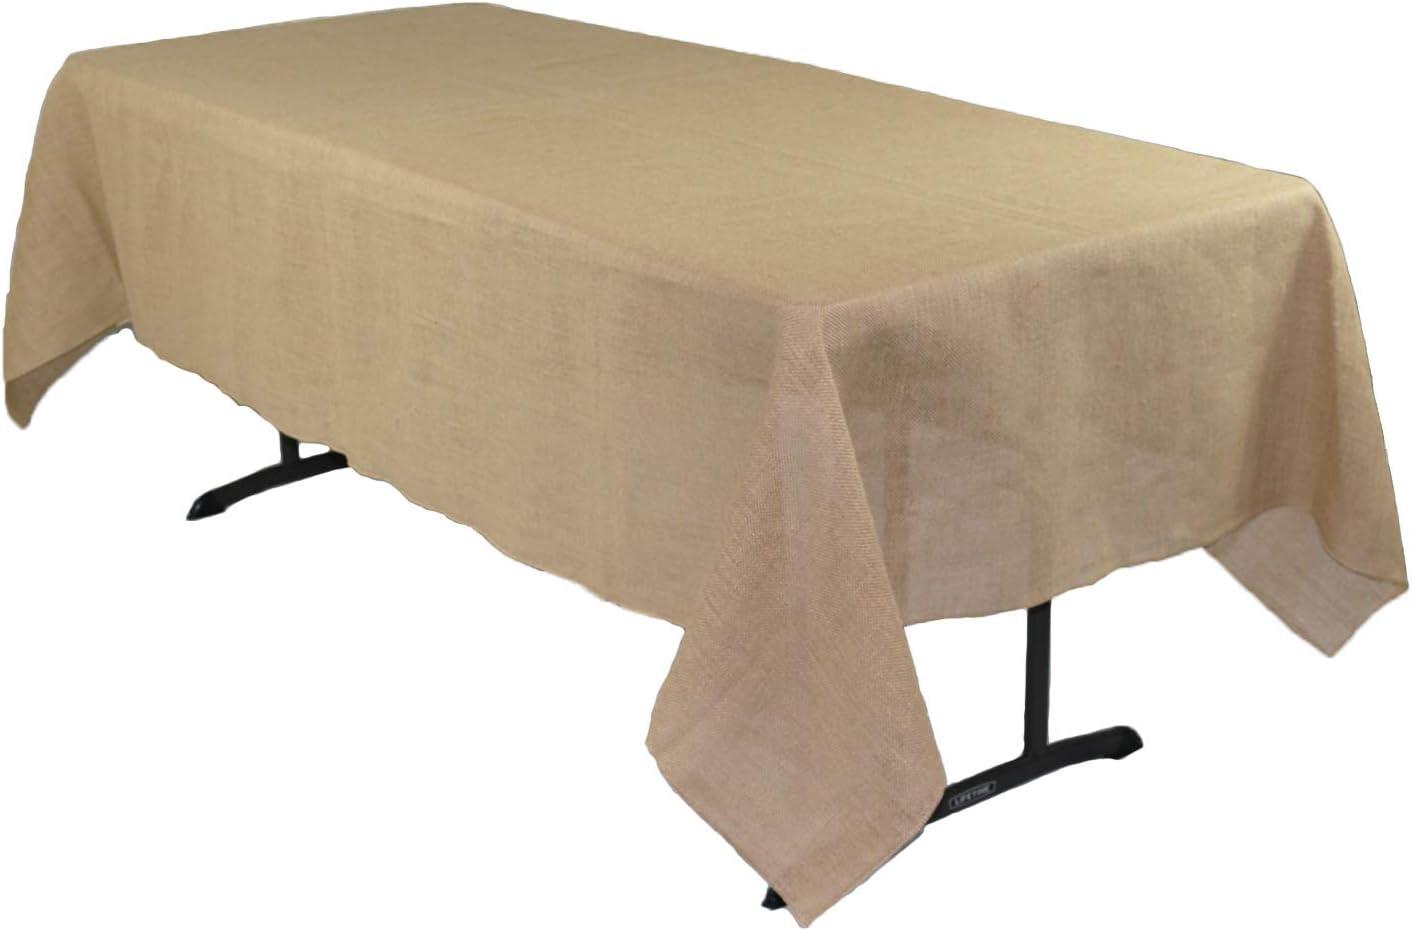 Your Chair 公式ショップ Covers - 60 x Rustic Rectangular 102 Jute 開店記念セール Natura Inch